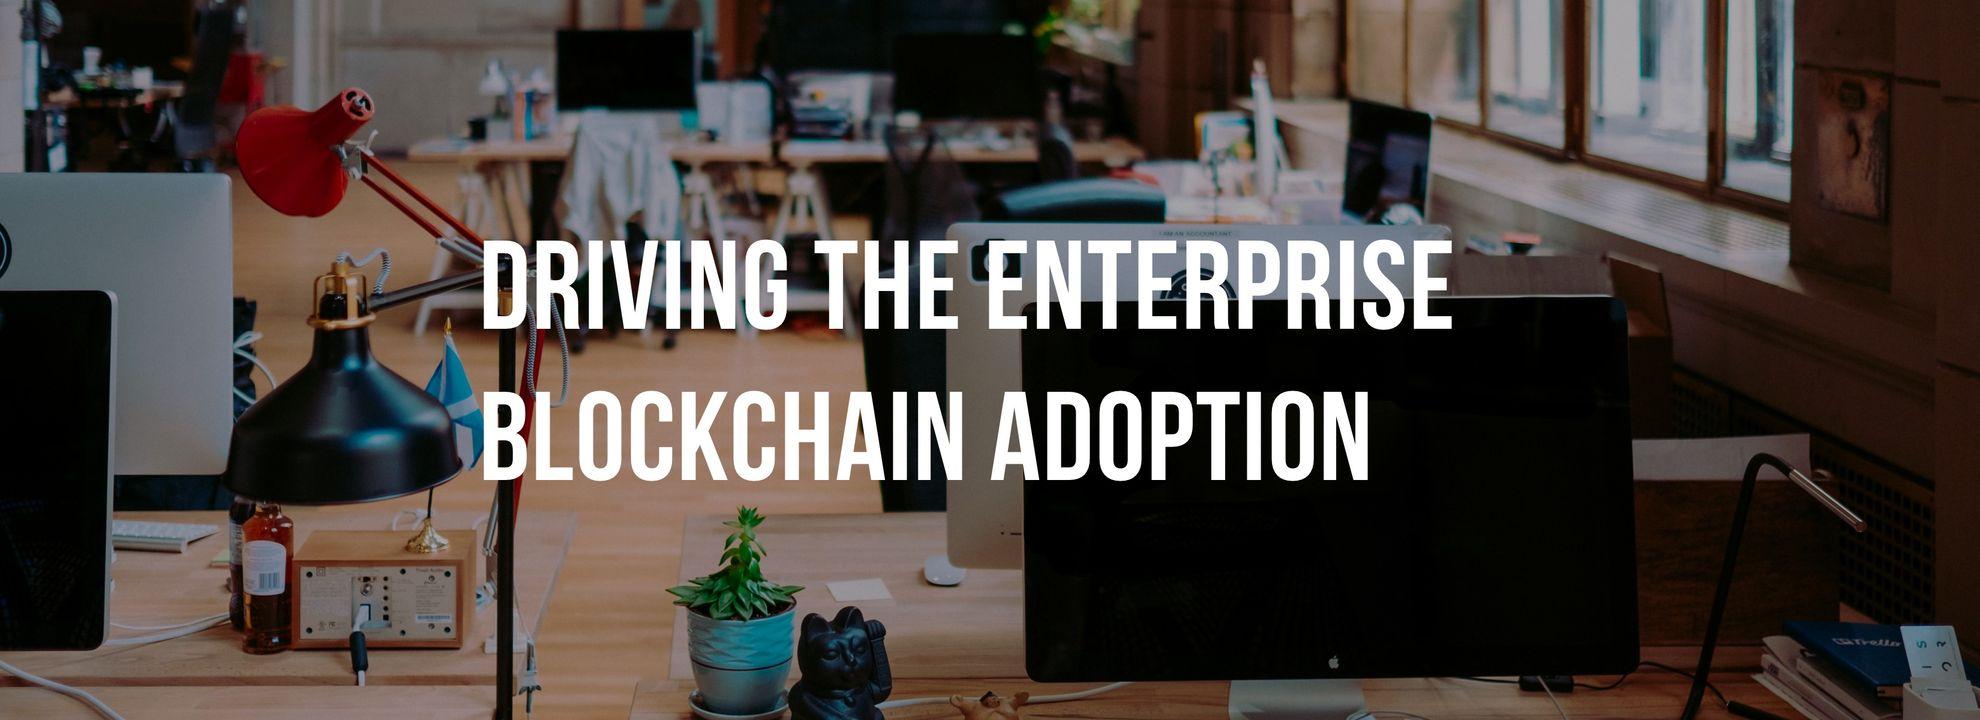 Driving the Enterprise Blockchain Adoption